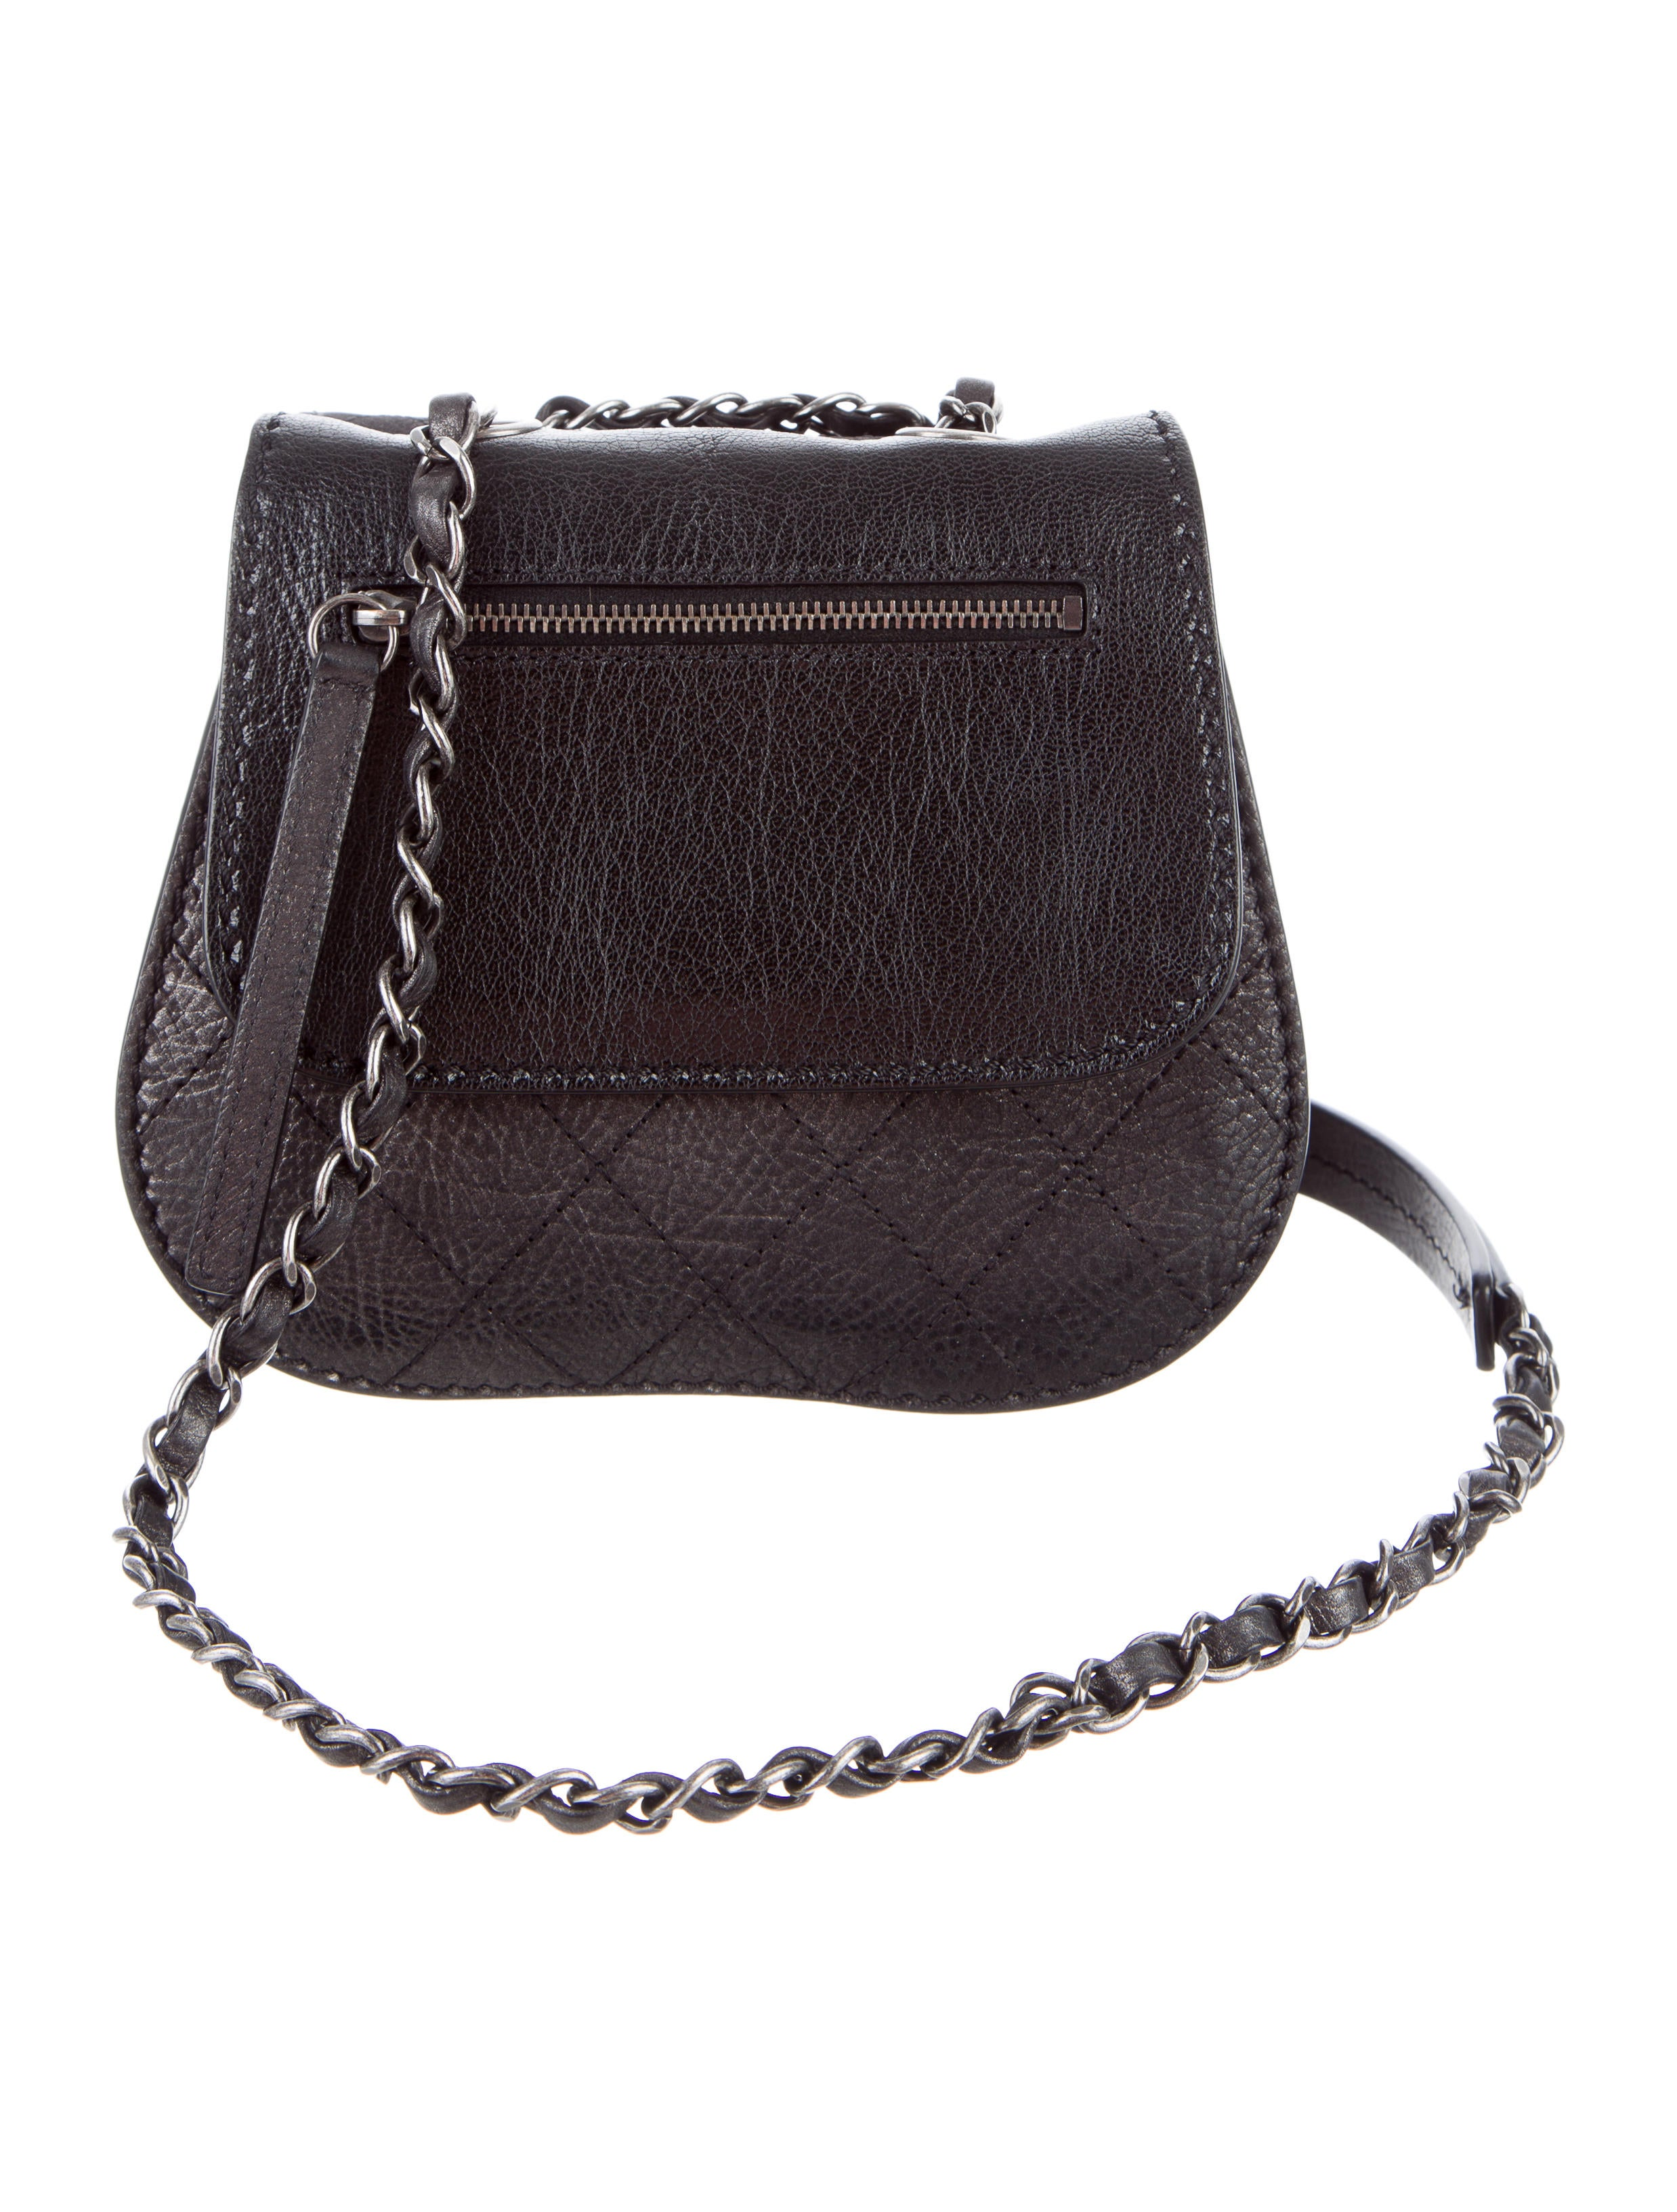 Chanel Coco Twin Small Flap Bag - Handbags - CHA185817 ...